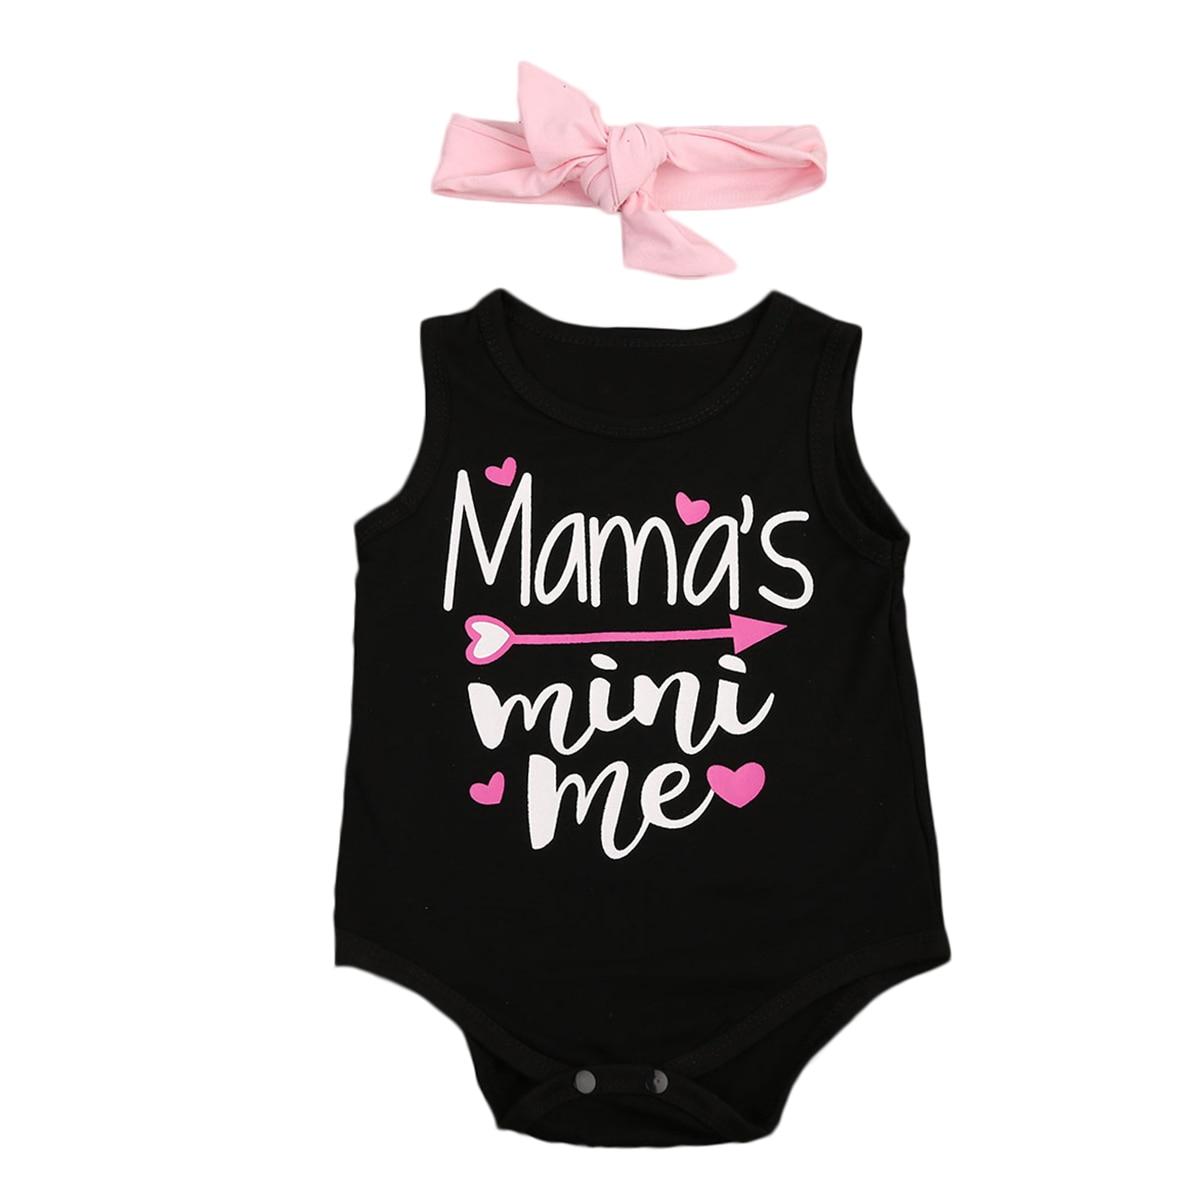 Mamas Mini Me Print Sleeveless Bodysuit With Headband For Baby Girl